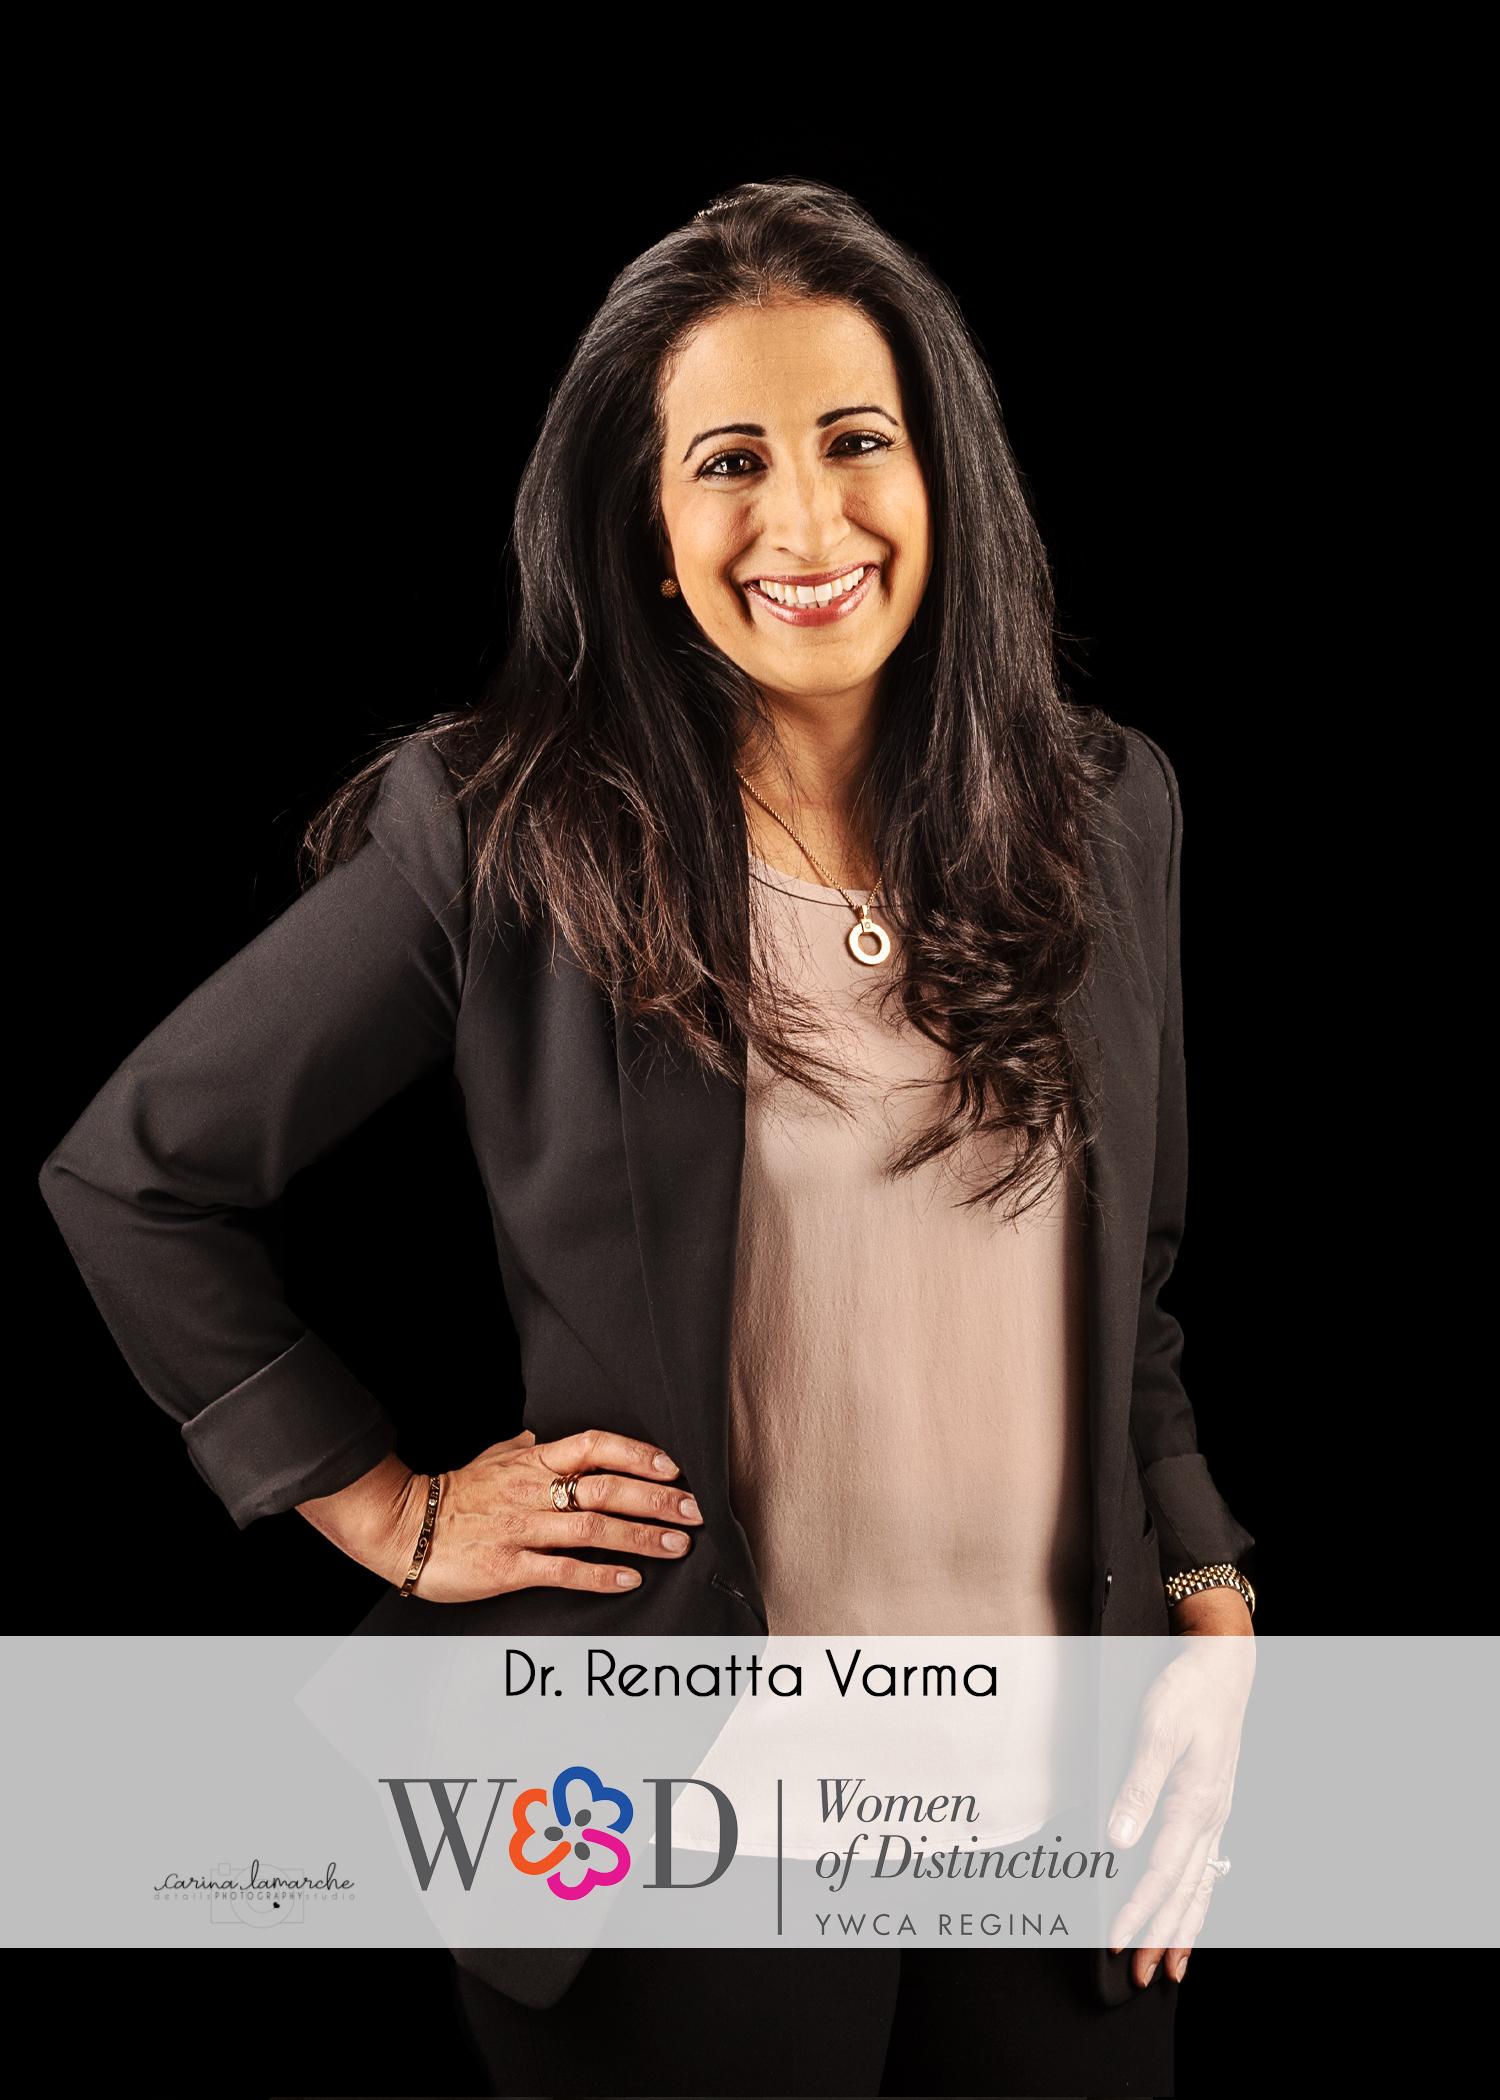 2019_031_Dr.Renatta_Varma_5x7.1.jpg